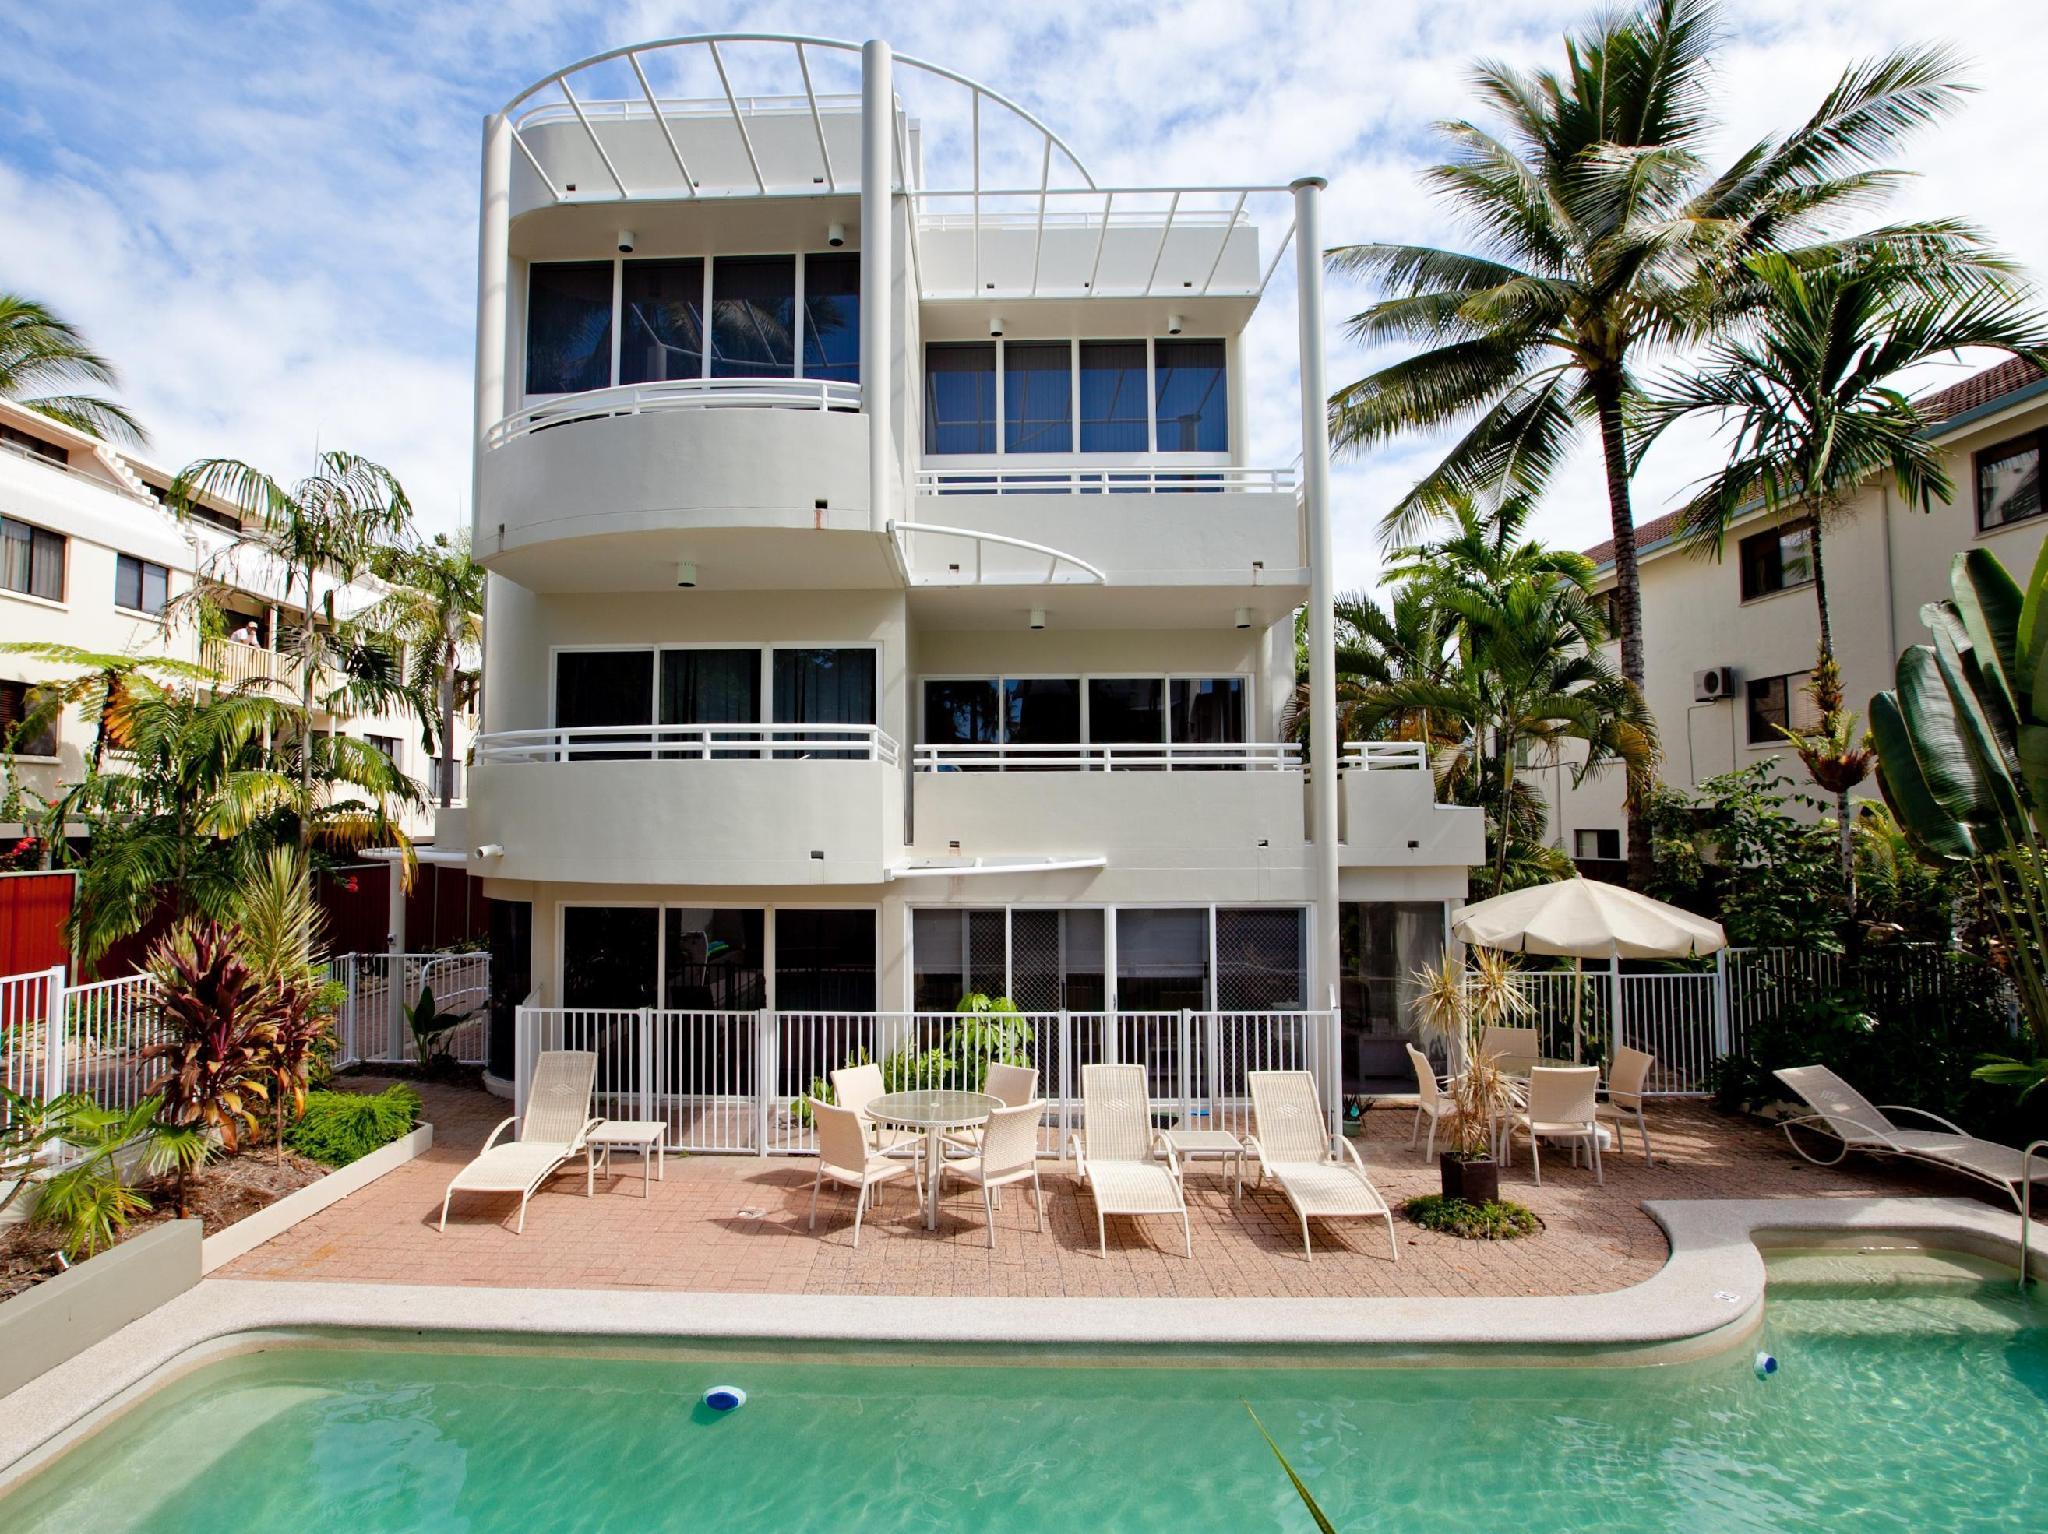 Latitude 16 Sunseeker Holiday Apartments - Hotell och Boende i Australien , Port Douglas